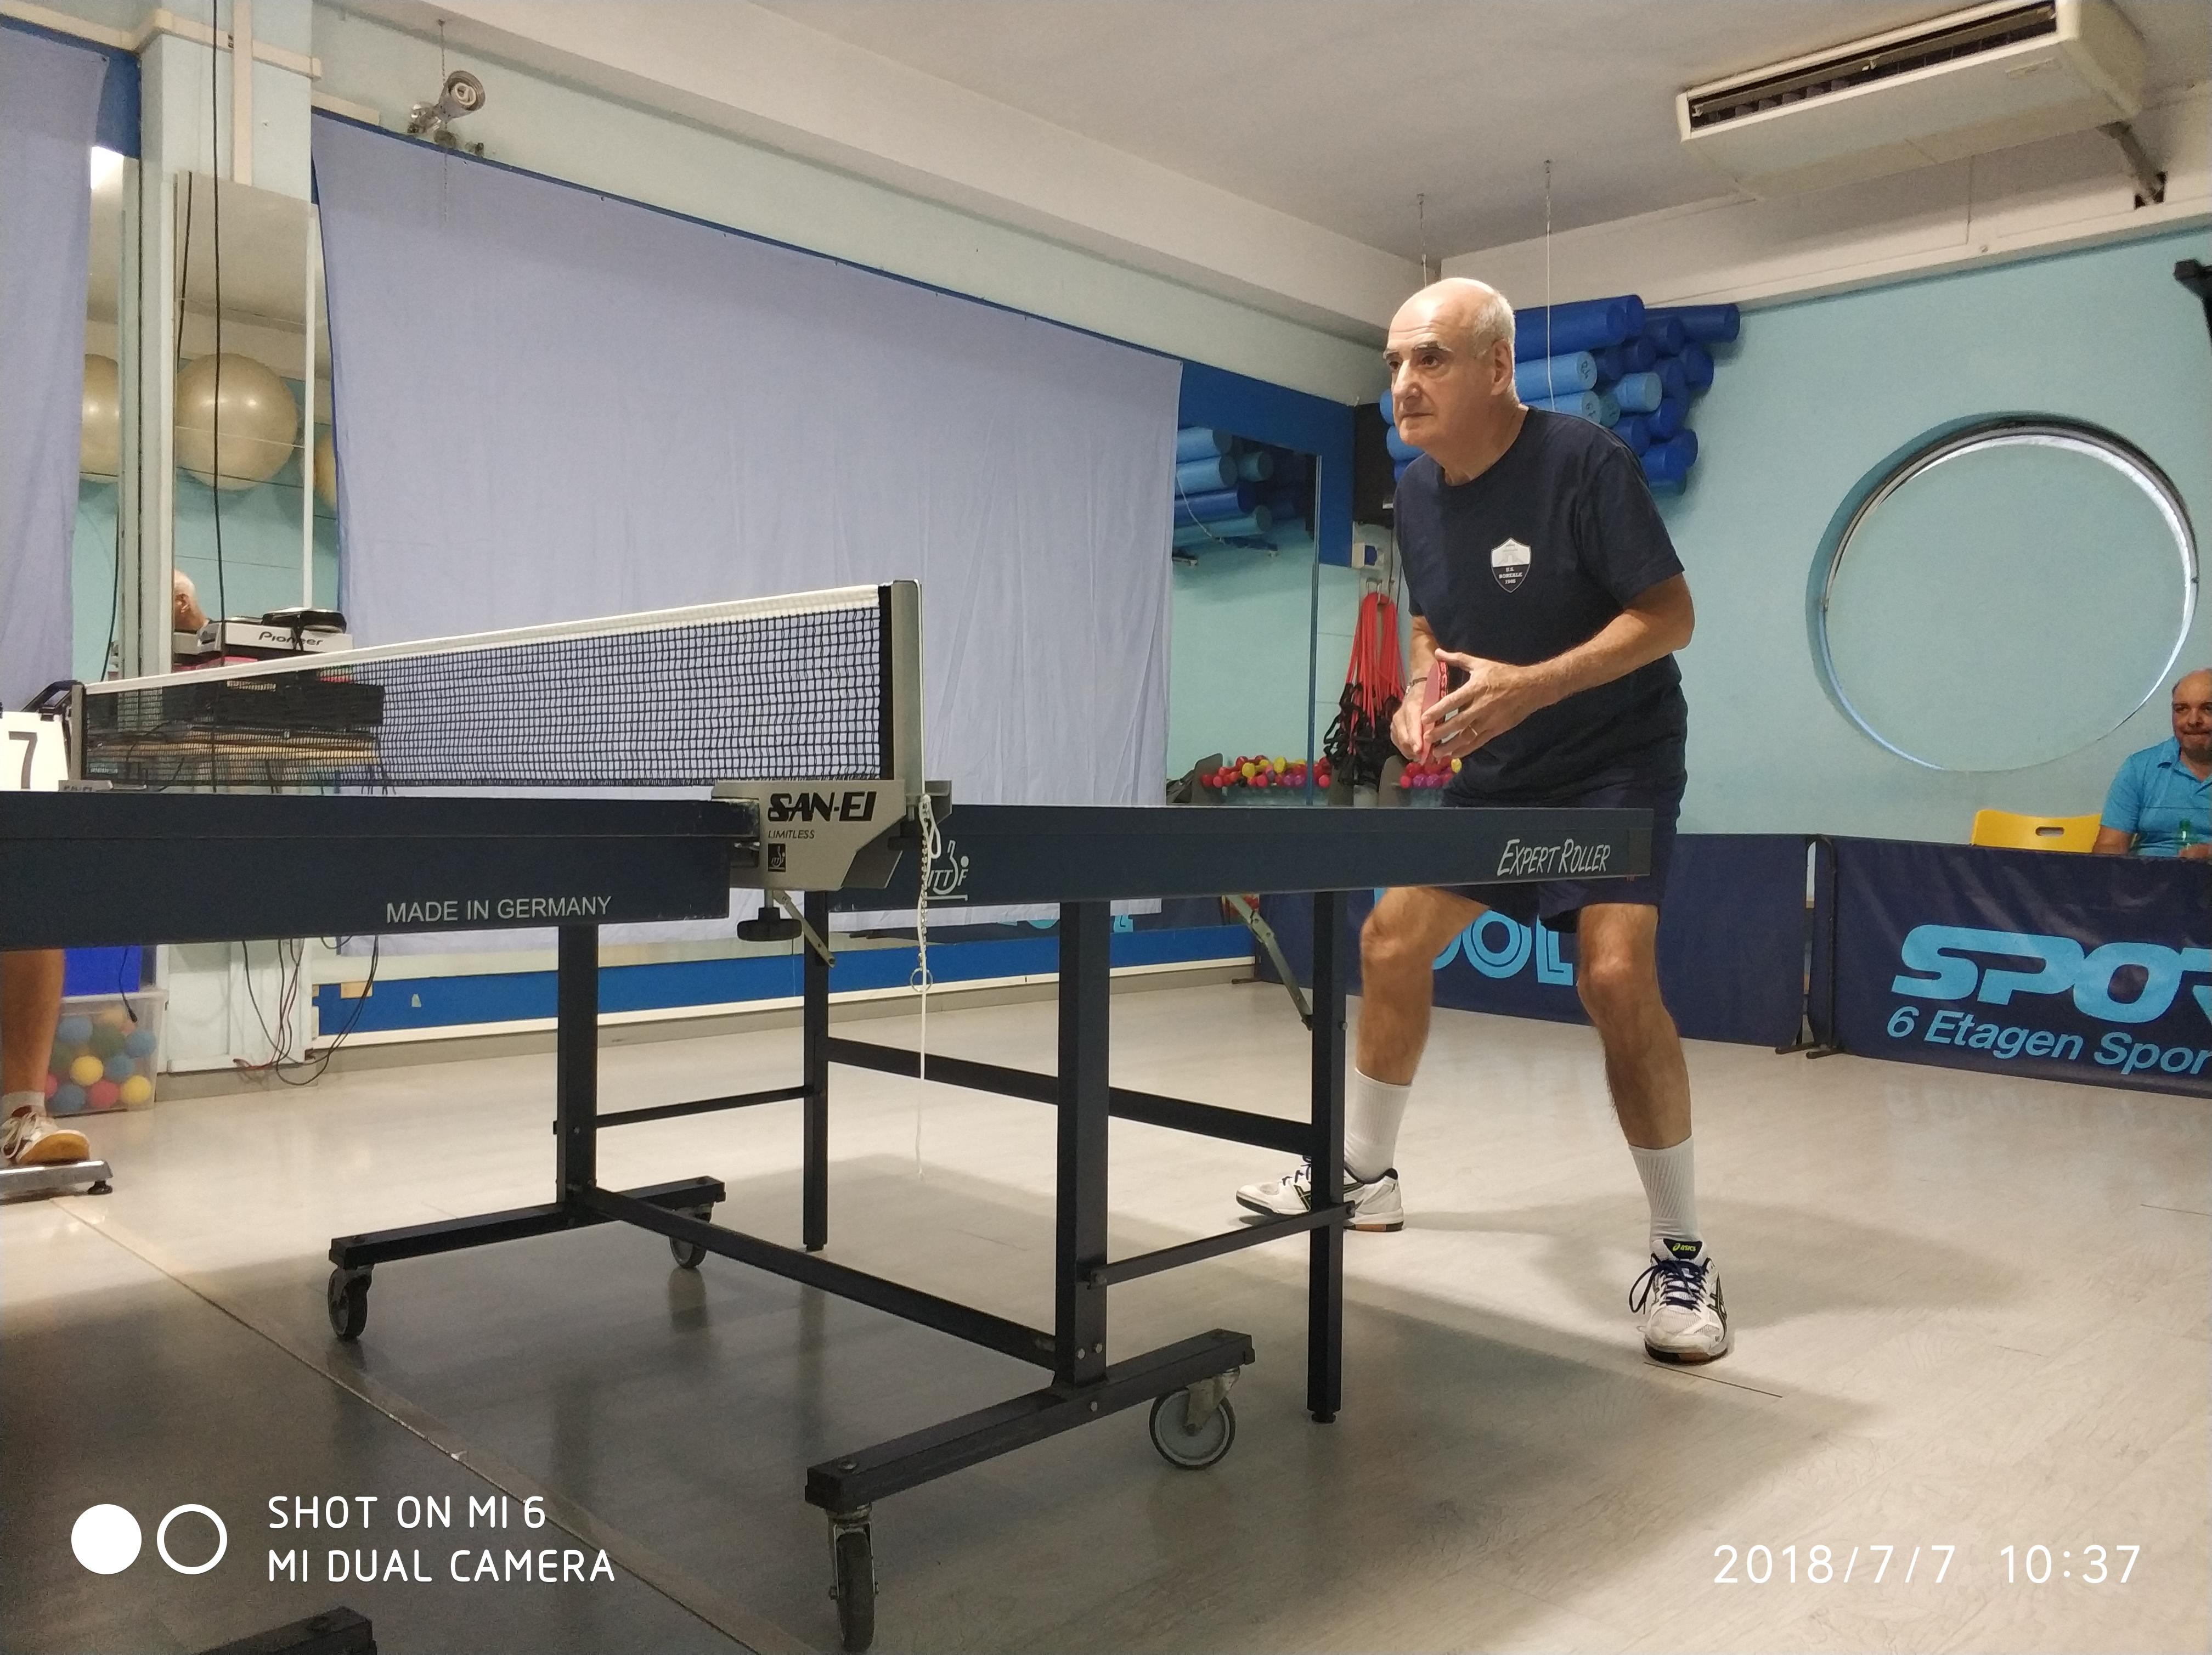 TENNIS TAVOLO 1